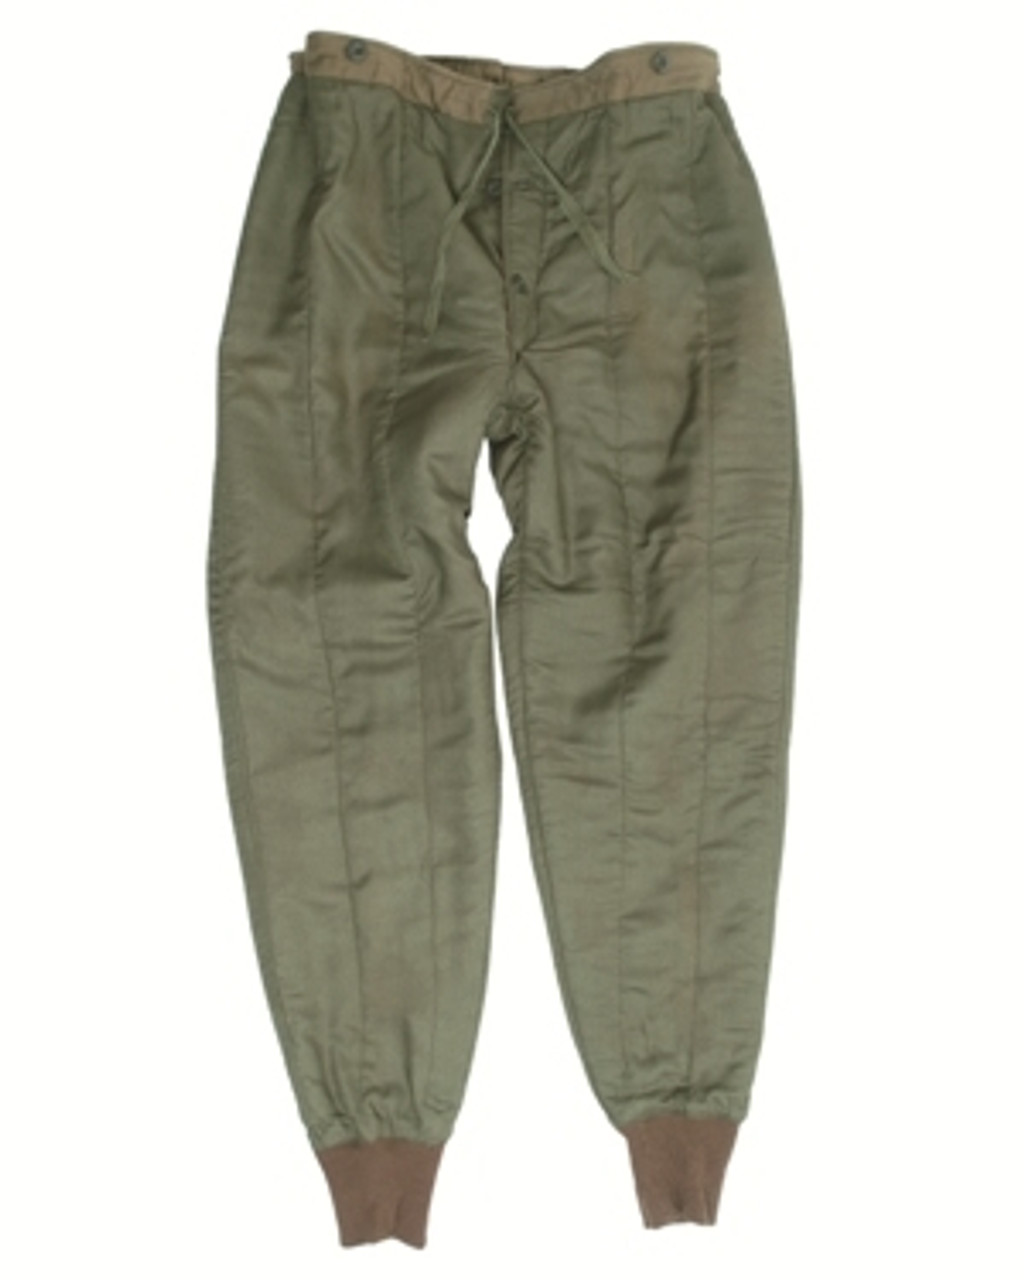 Cz M60 Cold Weather Pants Liner from Hessen Surplus from Hessen Surplus